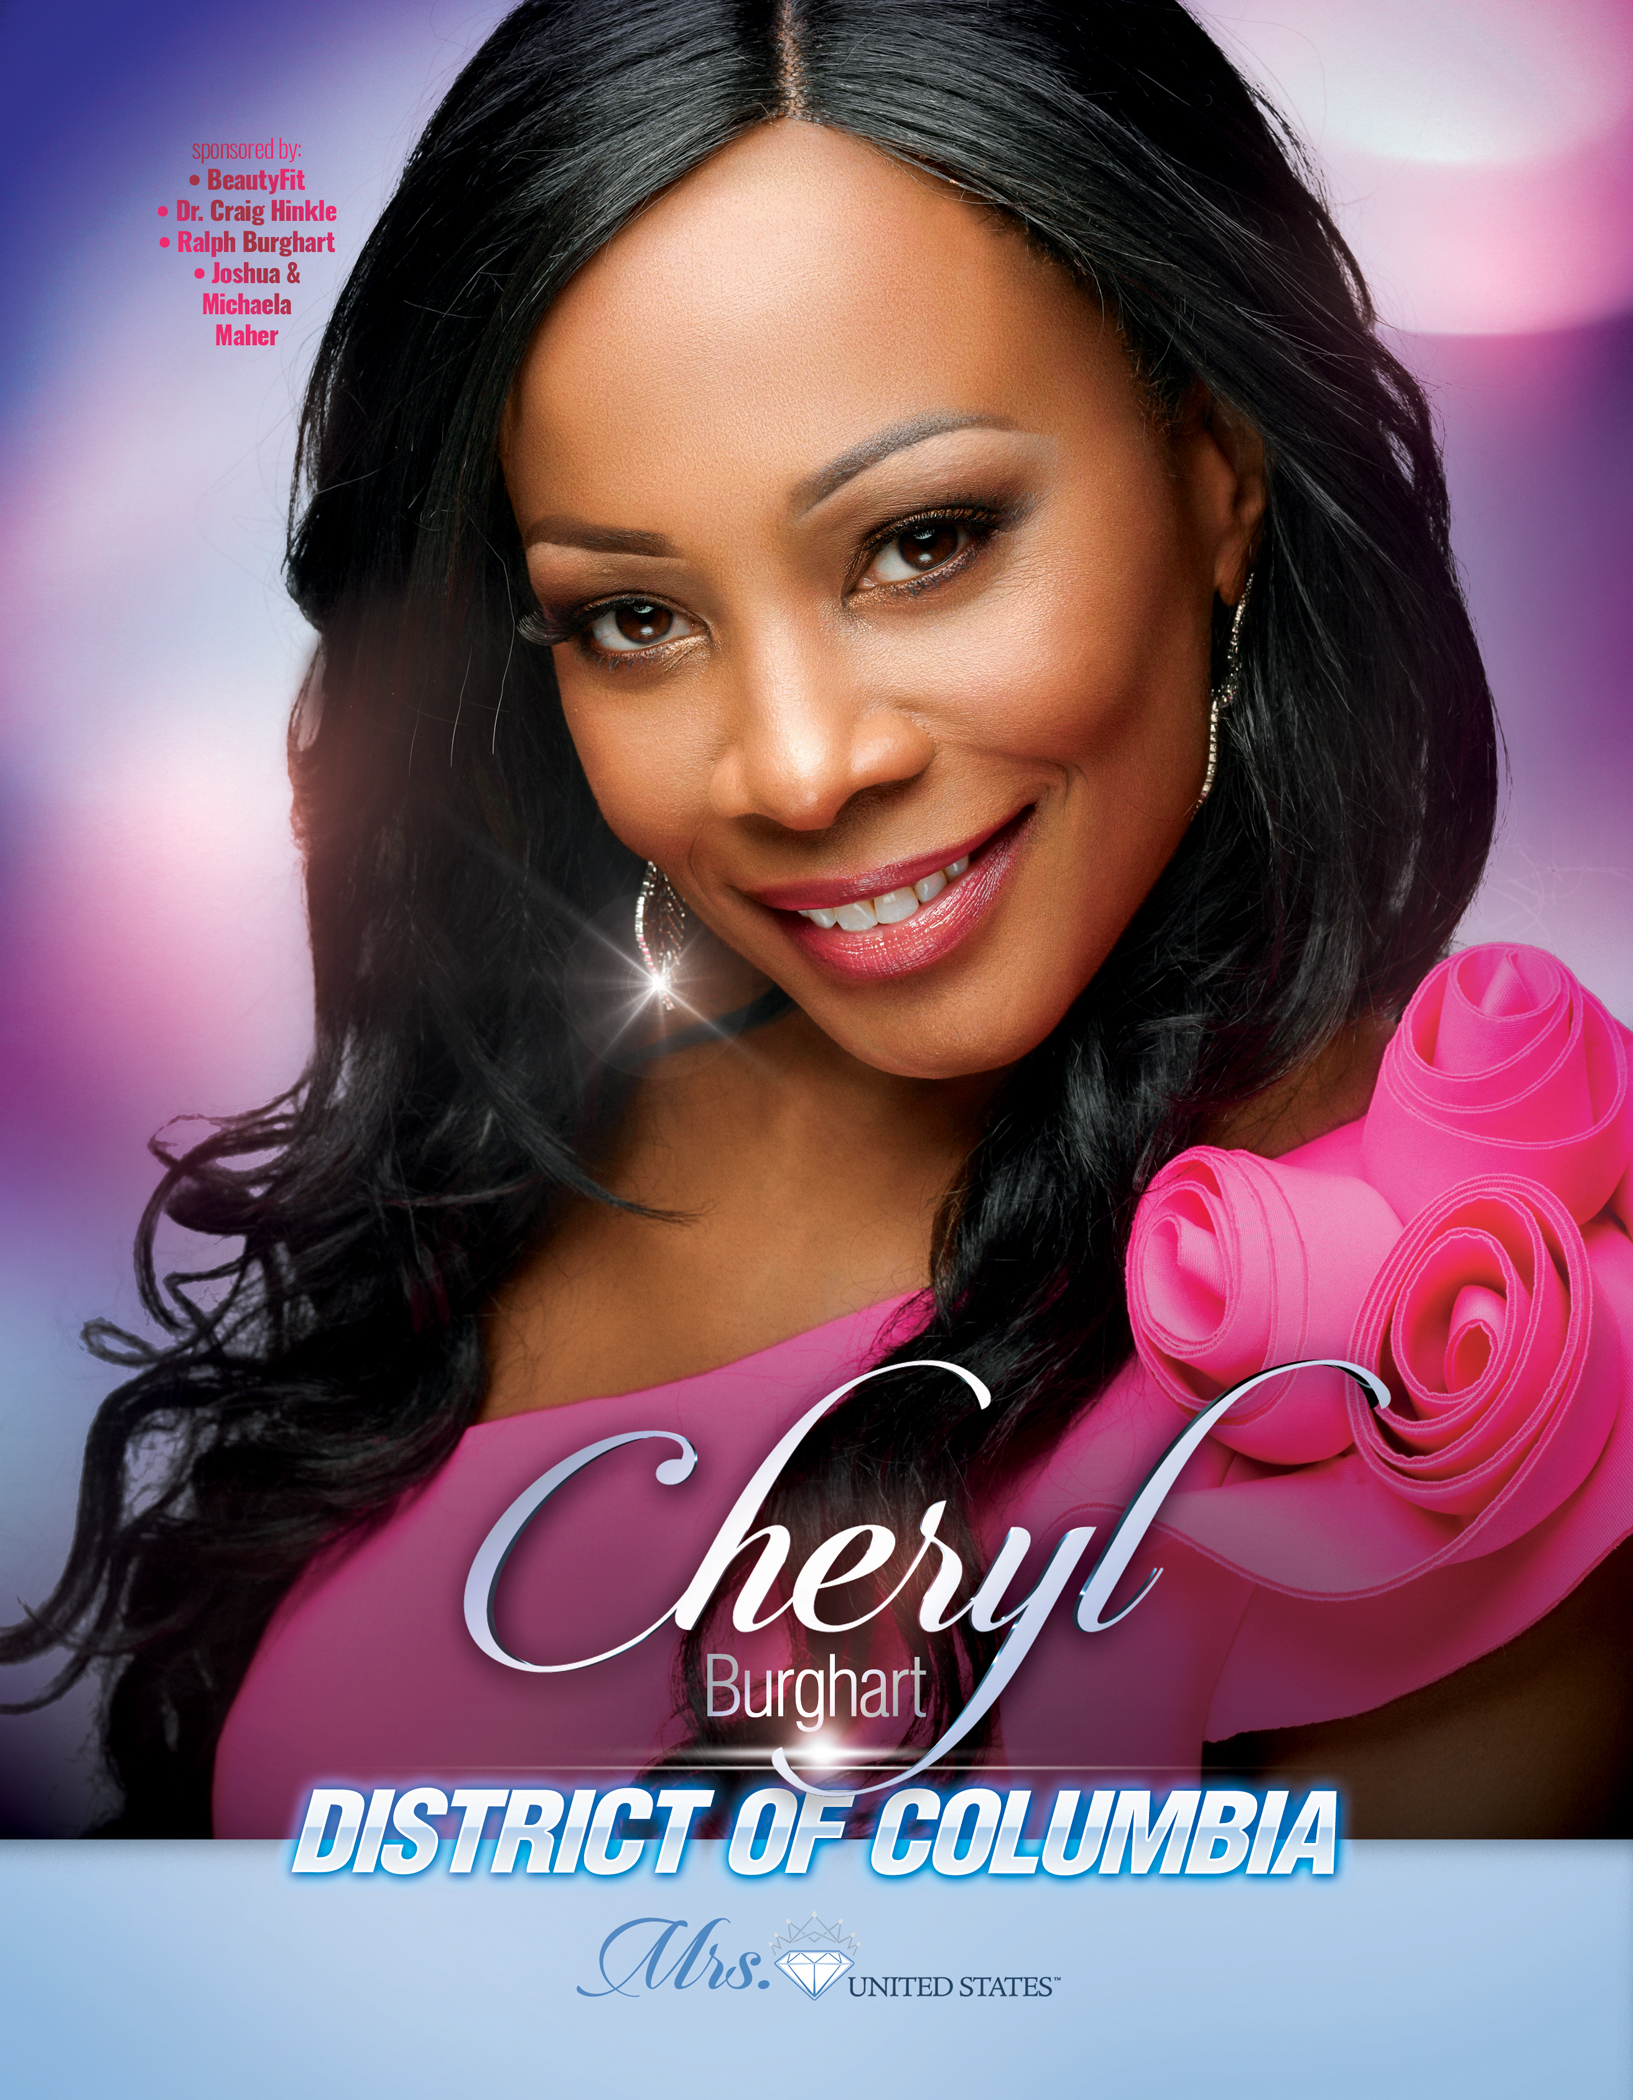 Cheryl Burghart Mrs. District of Columbia United States - 2019